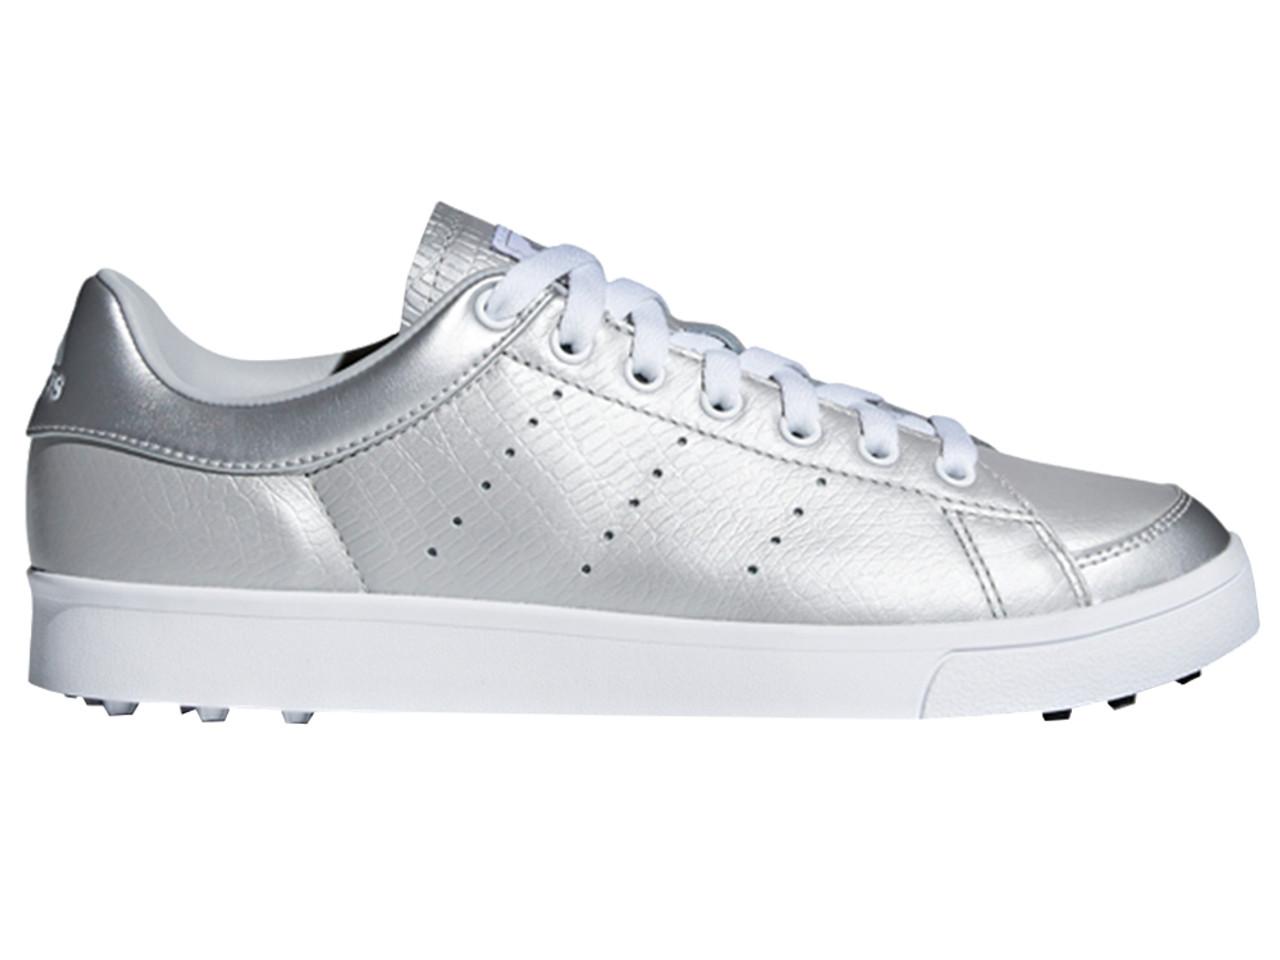 Pensar rizo lógica  Adidas W Adicross Classic Golf Shoes - Silver Met/FTWR White - Ladies    GolfBox